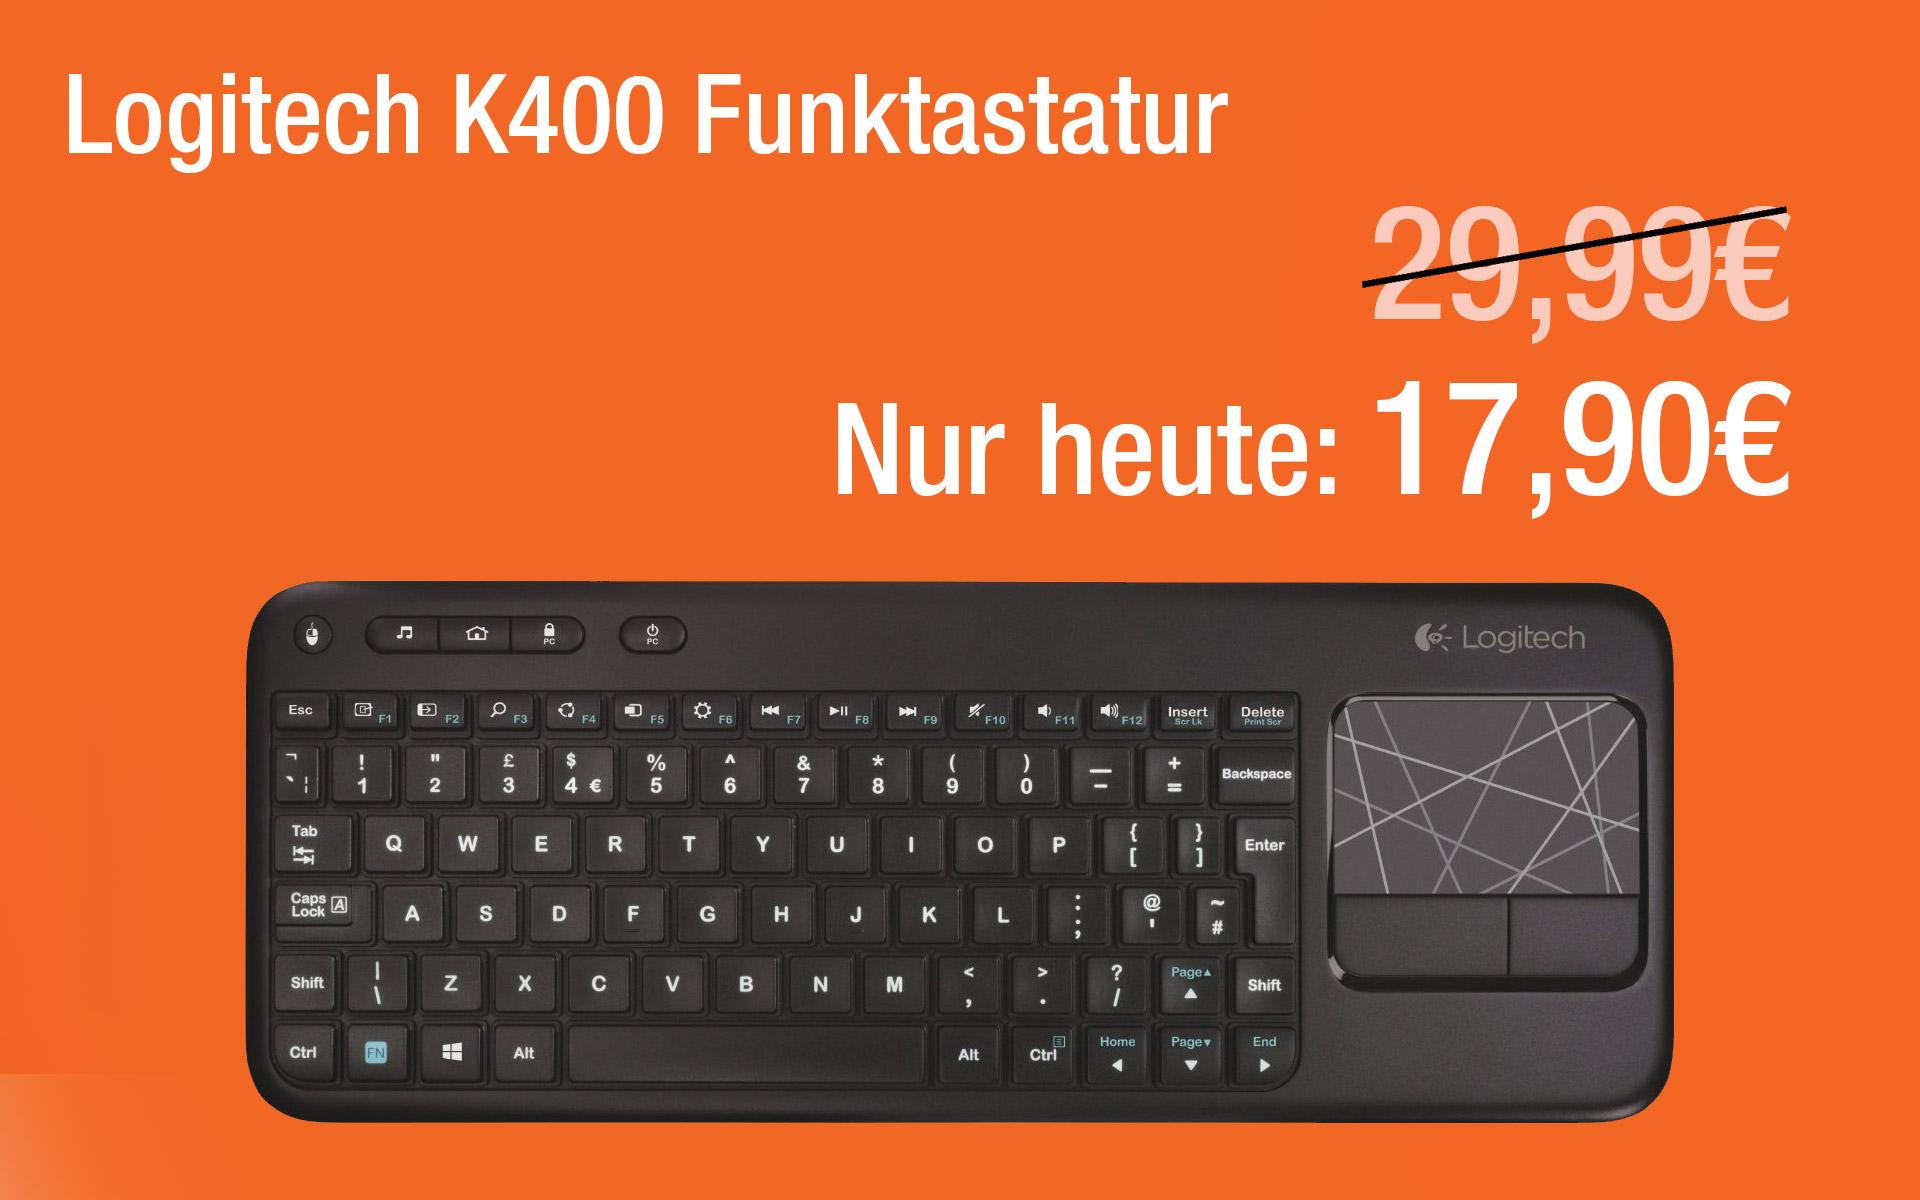 Heute nur 17,90€ – Logitech K400 Funktastatur